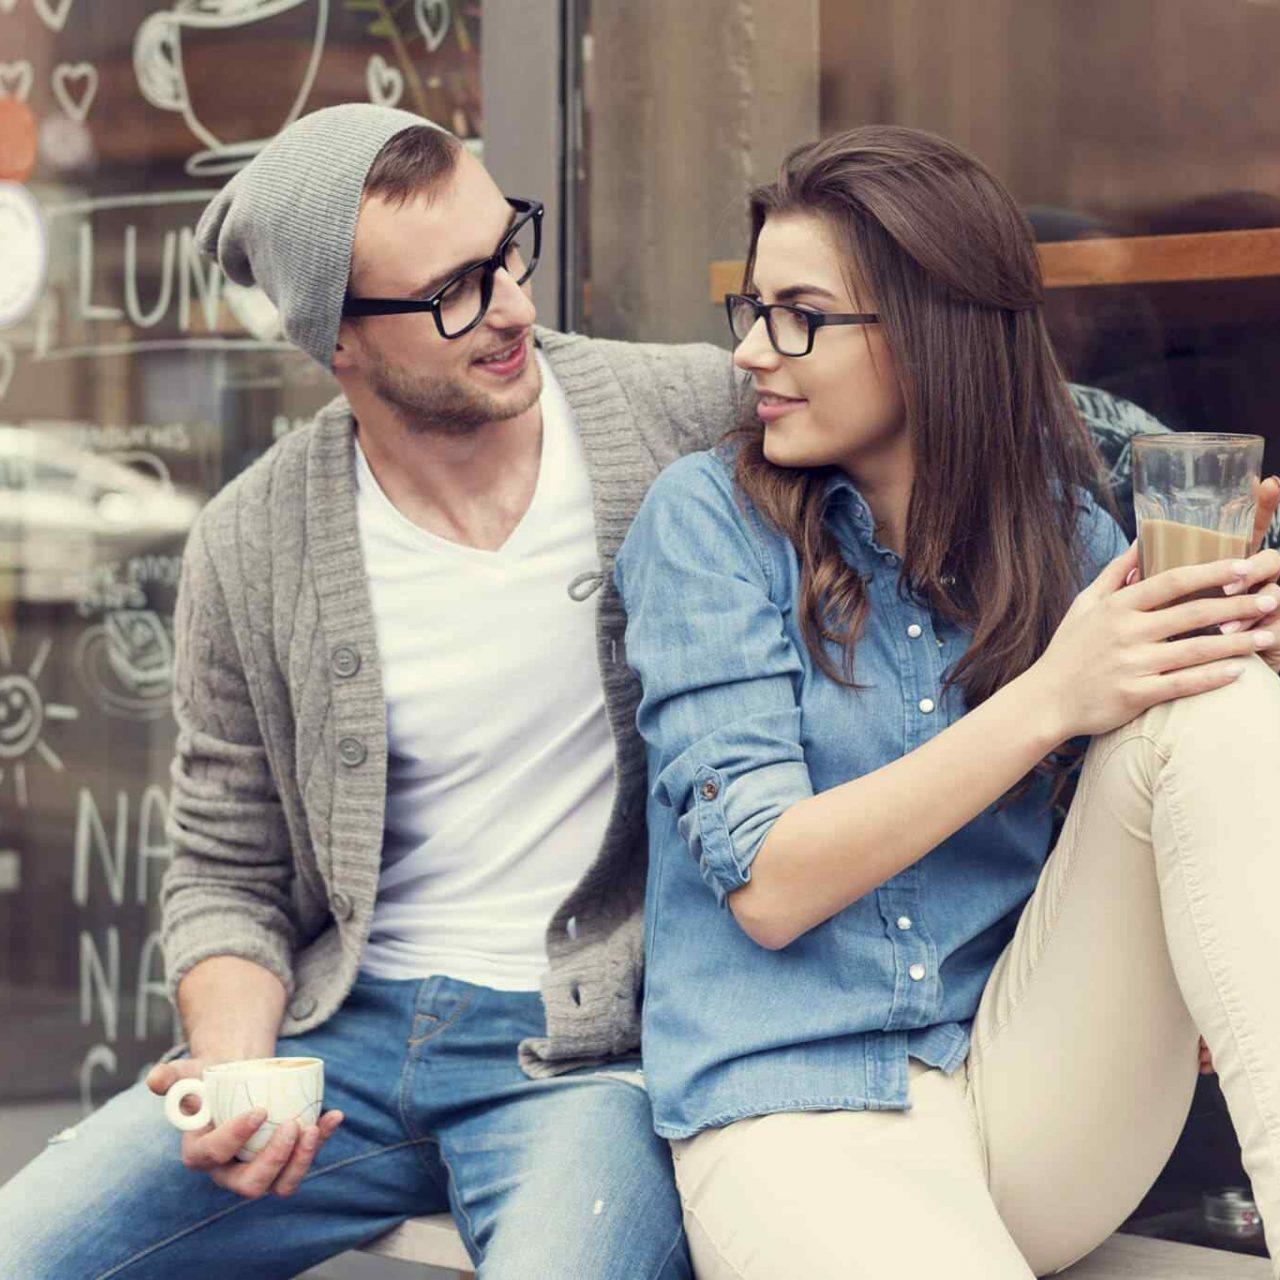 http://gotitasdepoliamor.com/wp-content/uploads/2018/01/img-class-marriage-02-1280x1280.jpg